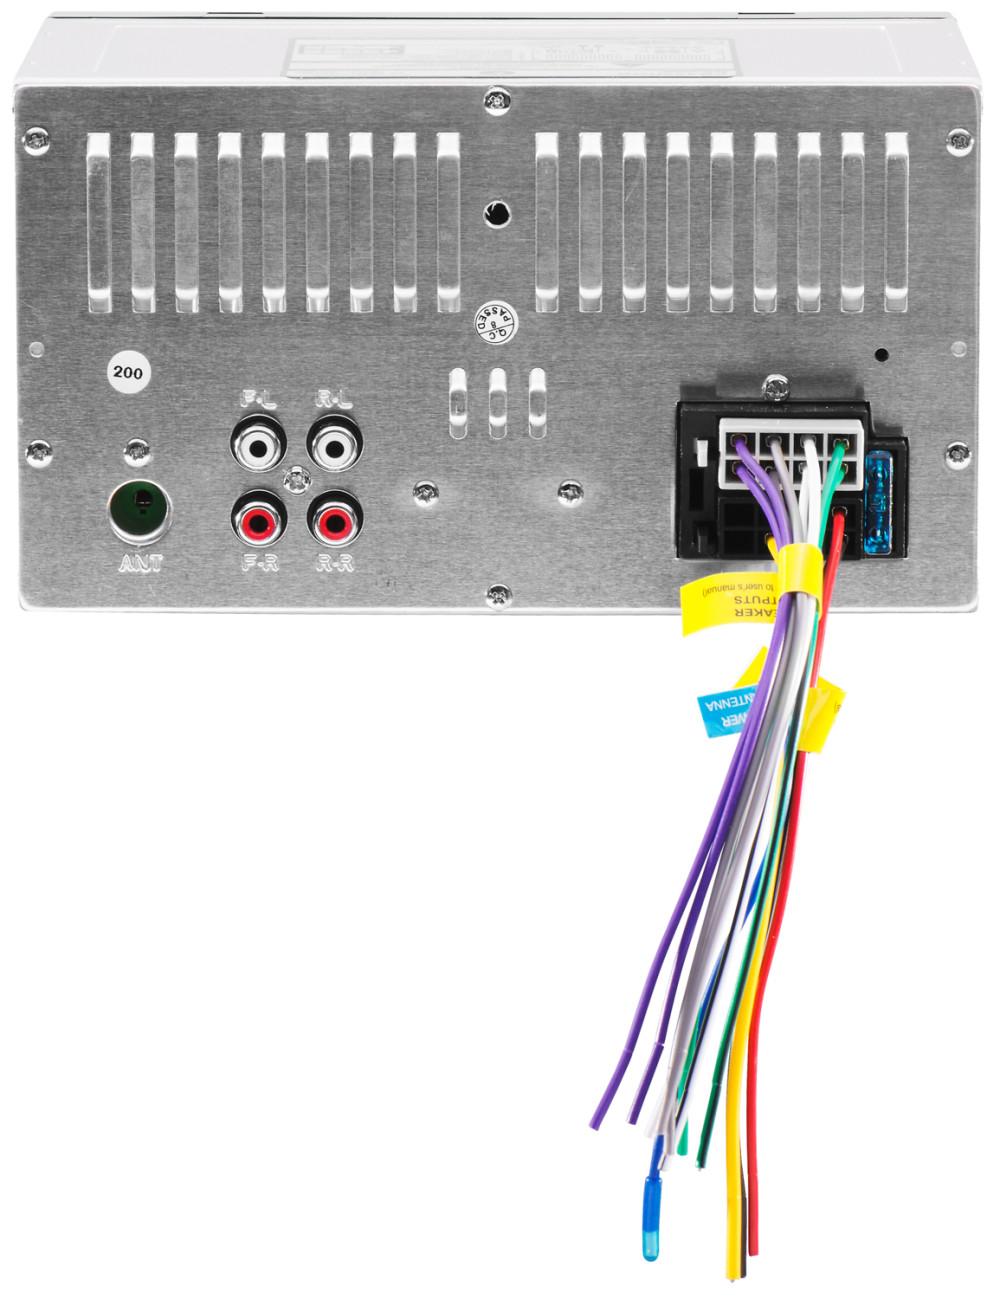 2008 Honda Cr V Radio Wiring Diagram On Xm Radio Antenna Wiring